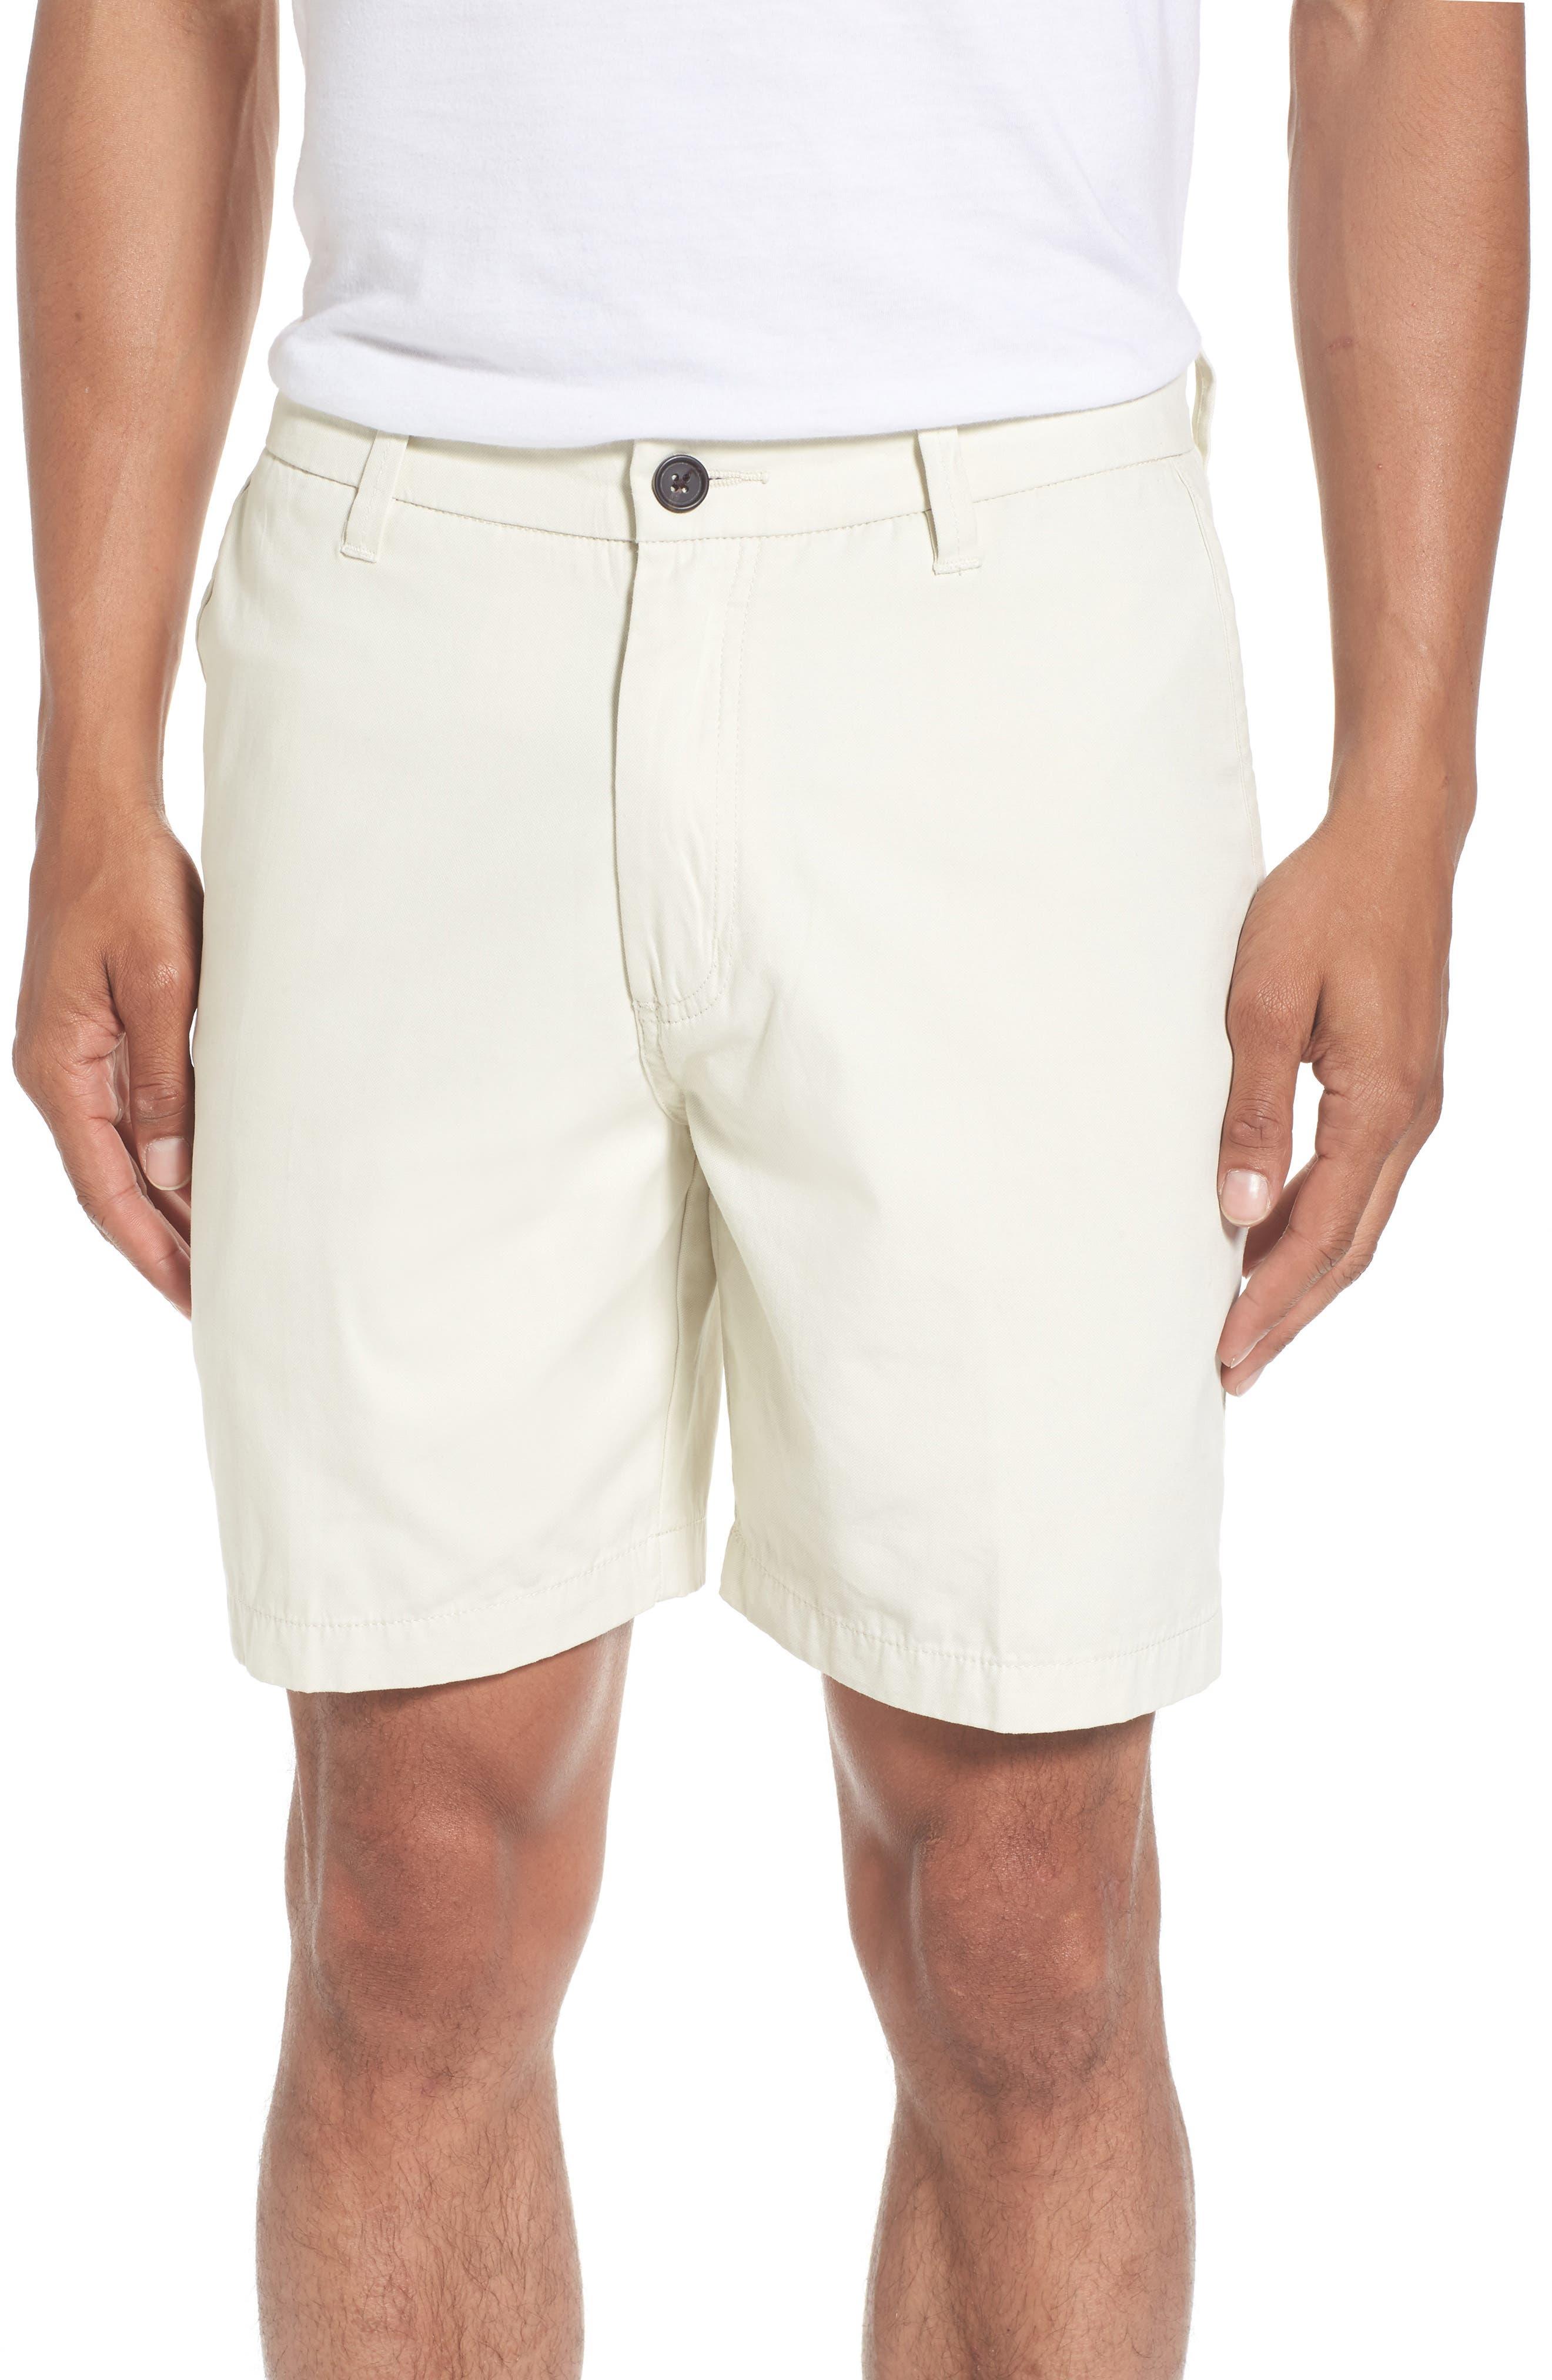 Shortie Chino Shorts,                         Main,                         color, 108